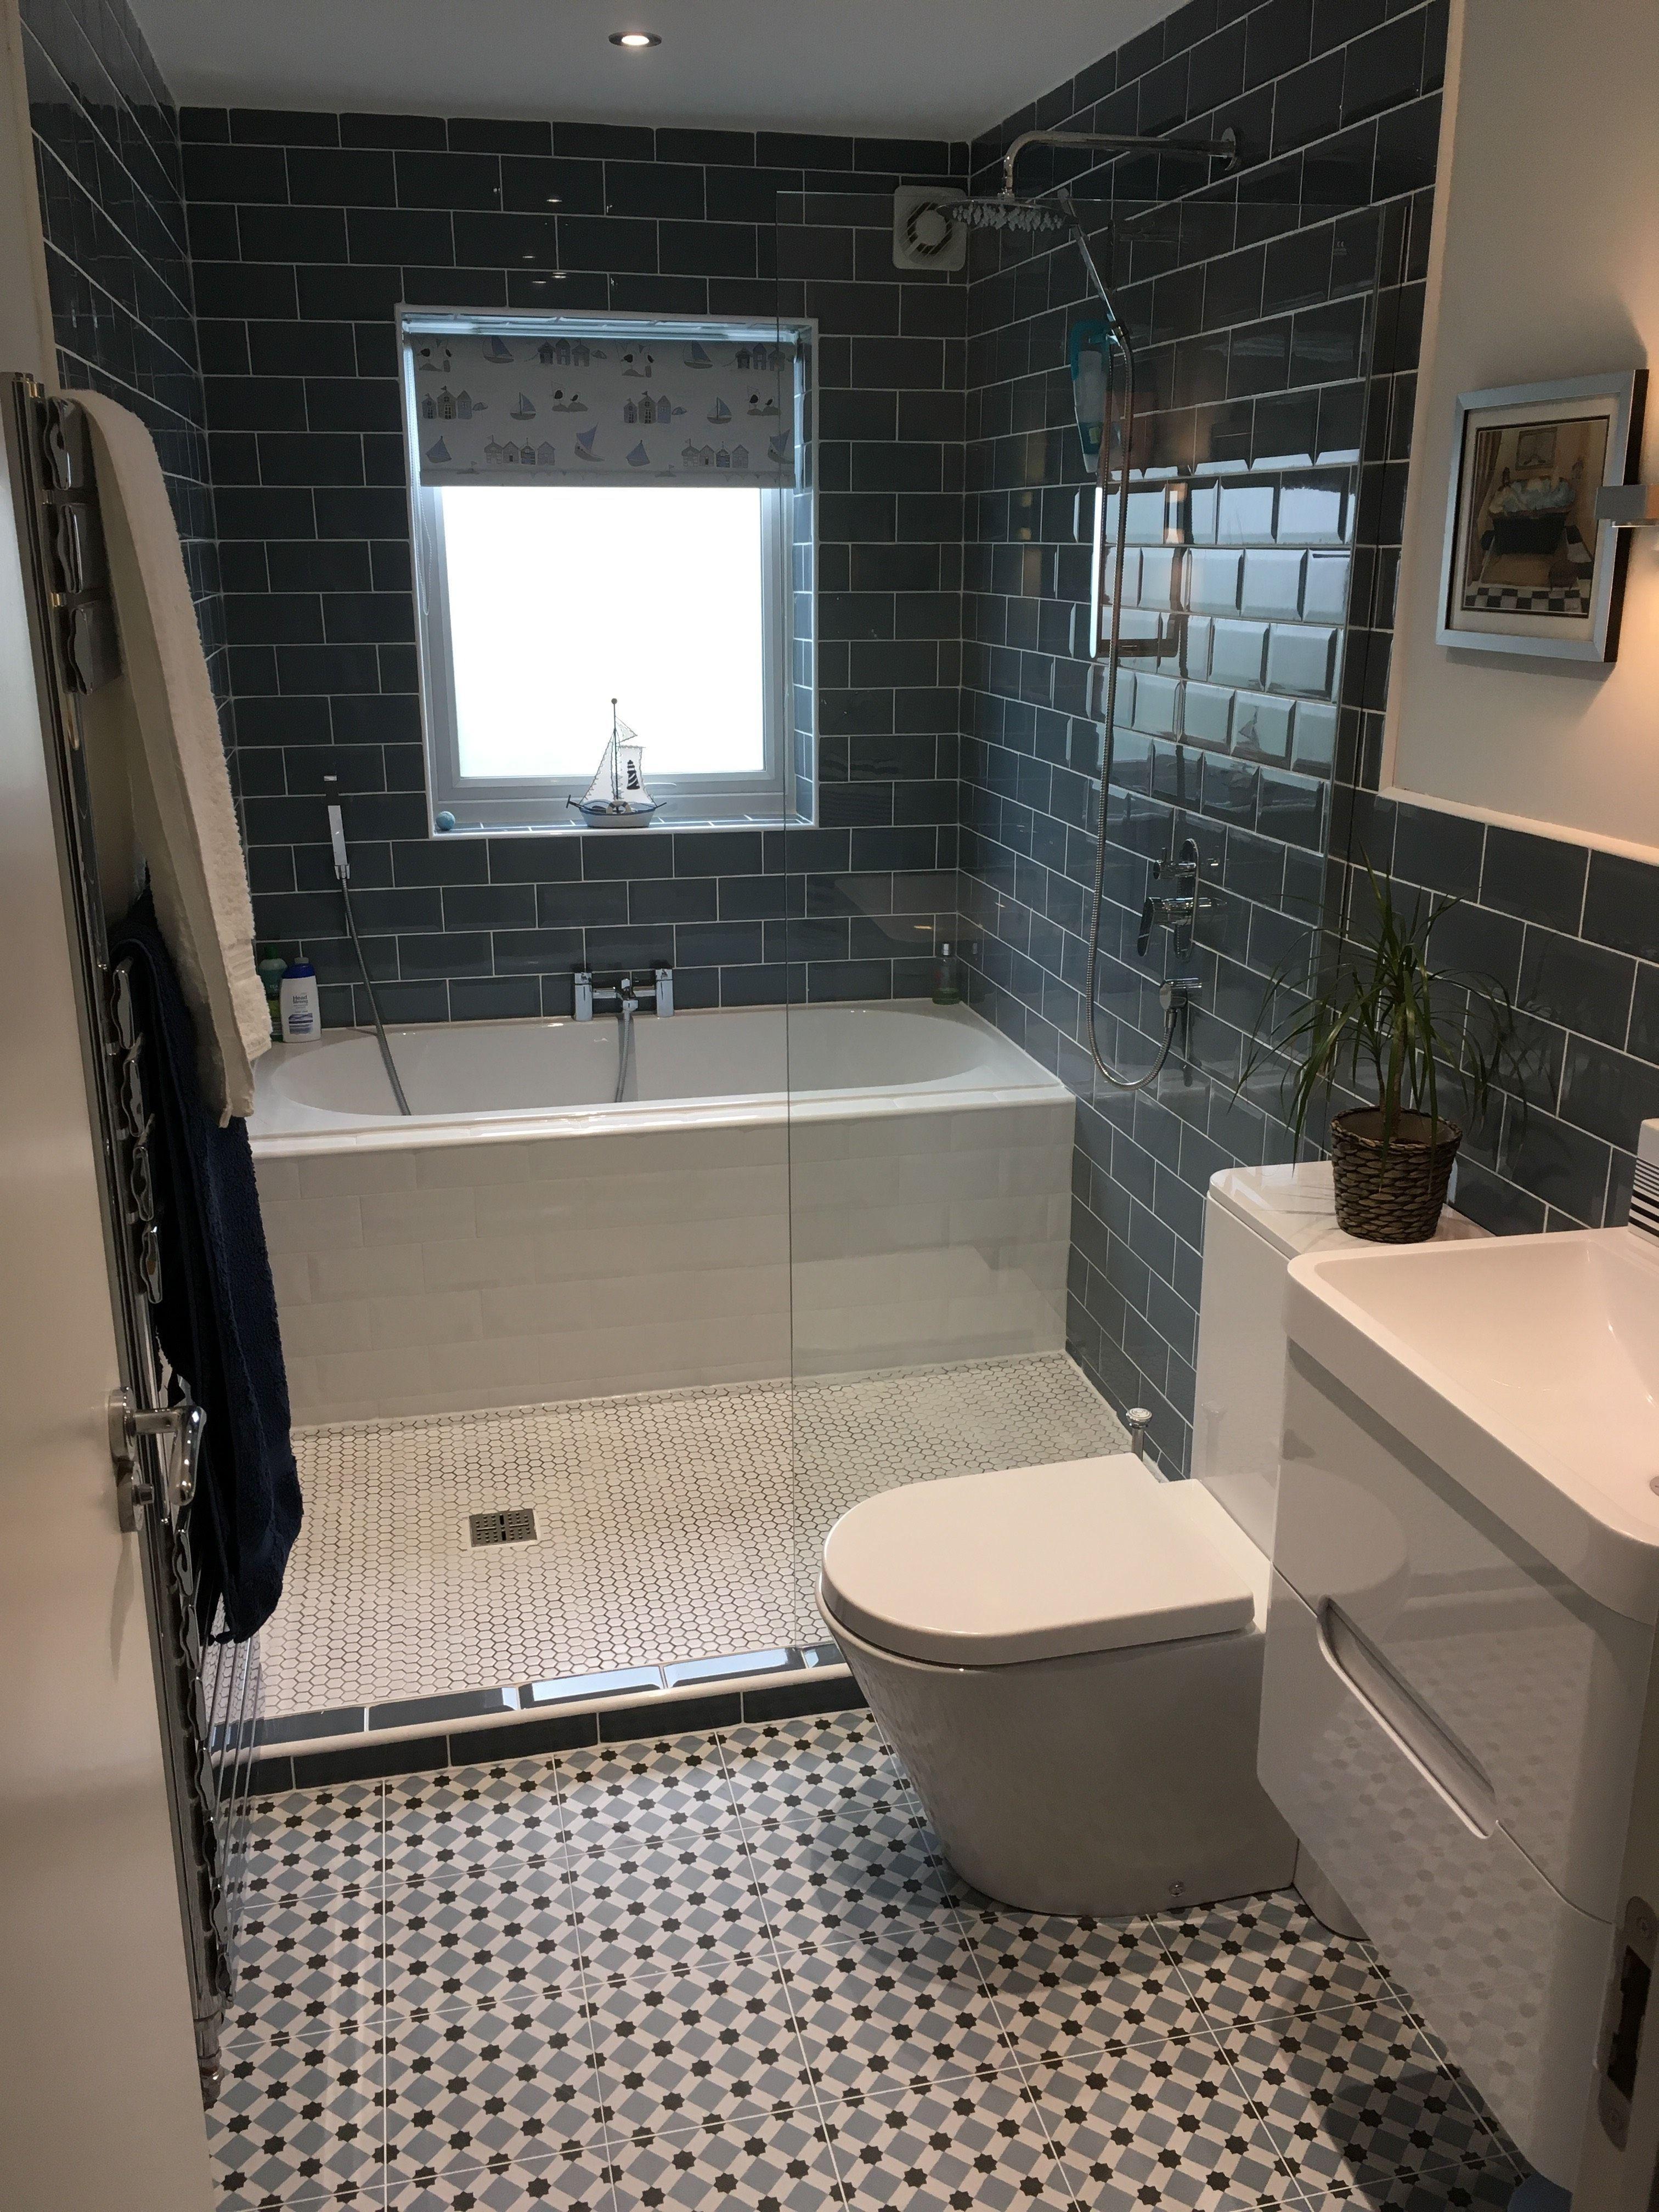 30 Small Bathroom Ideas Beautiful Design Decor For Your